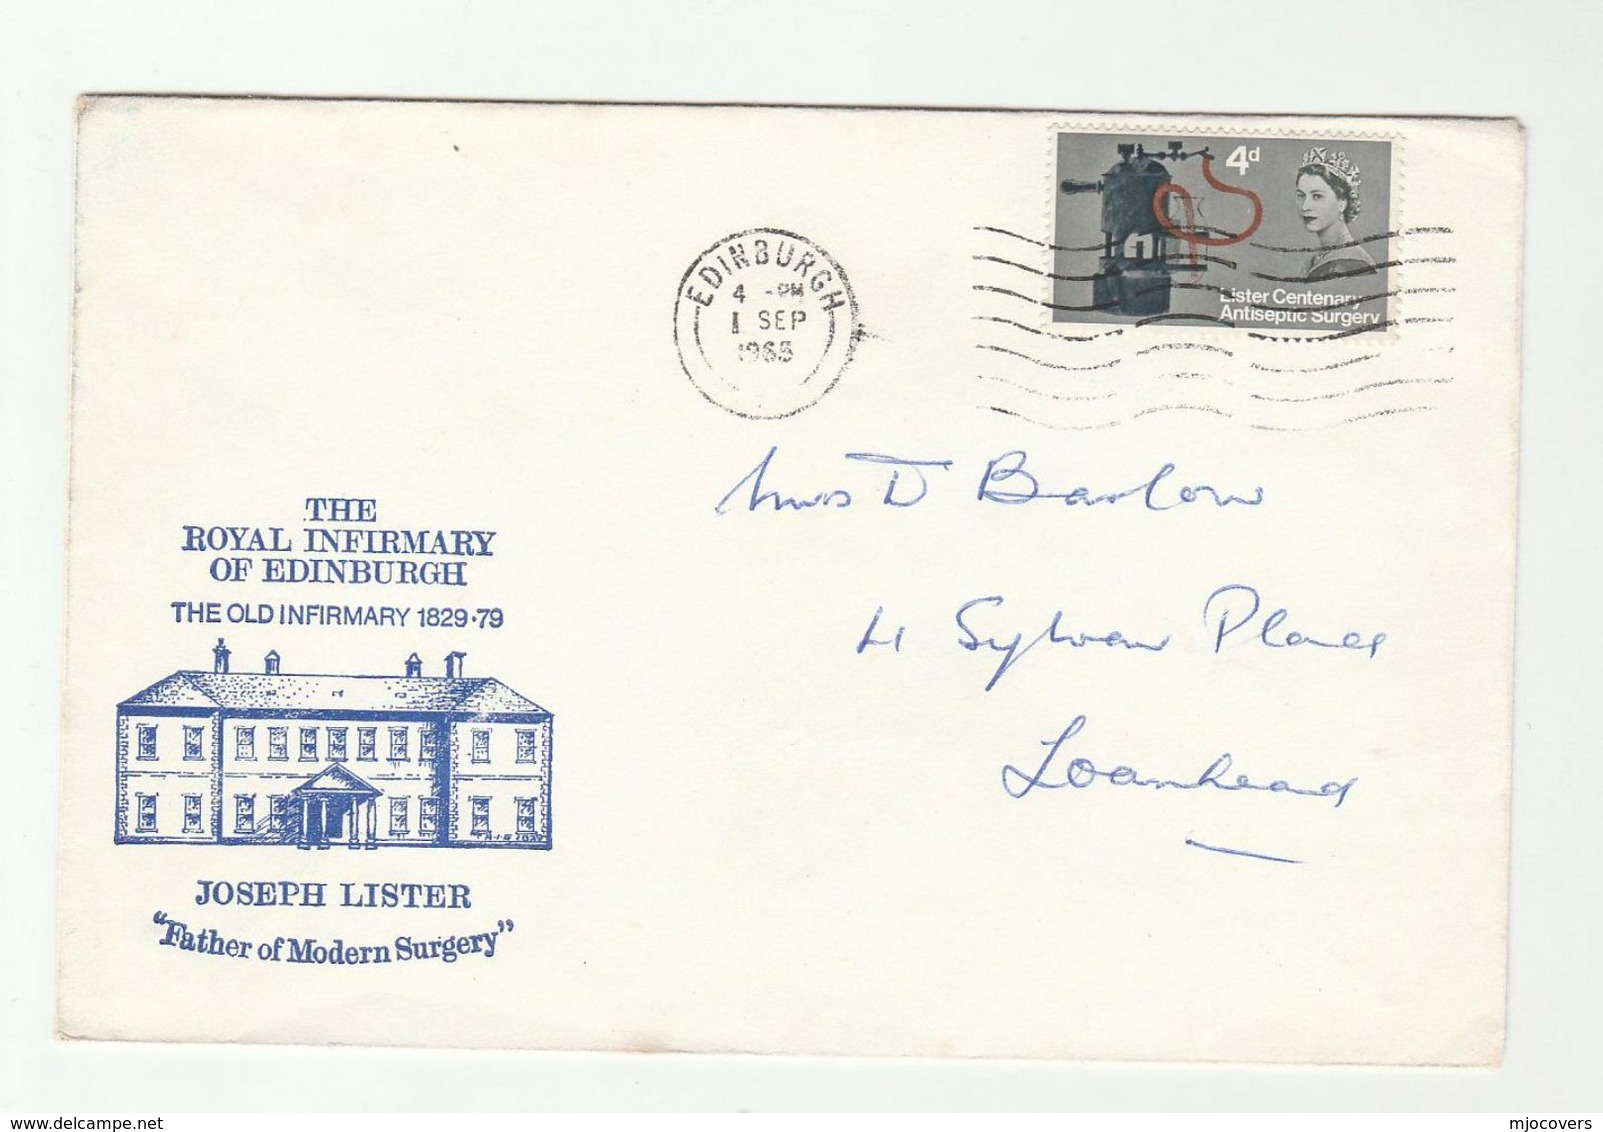 1965 ROYAL INFIRMARY EDINBURGH GB FDC Joseph LISTER Stamps Medicine Health Cover - FDC